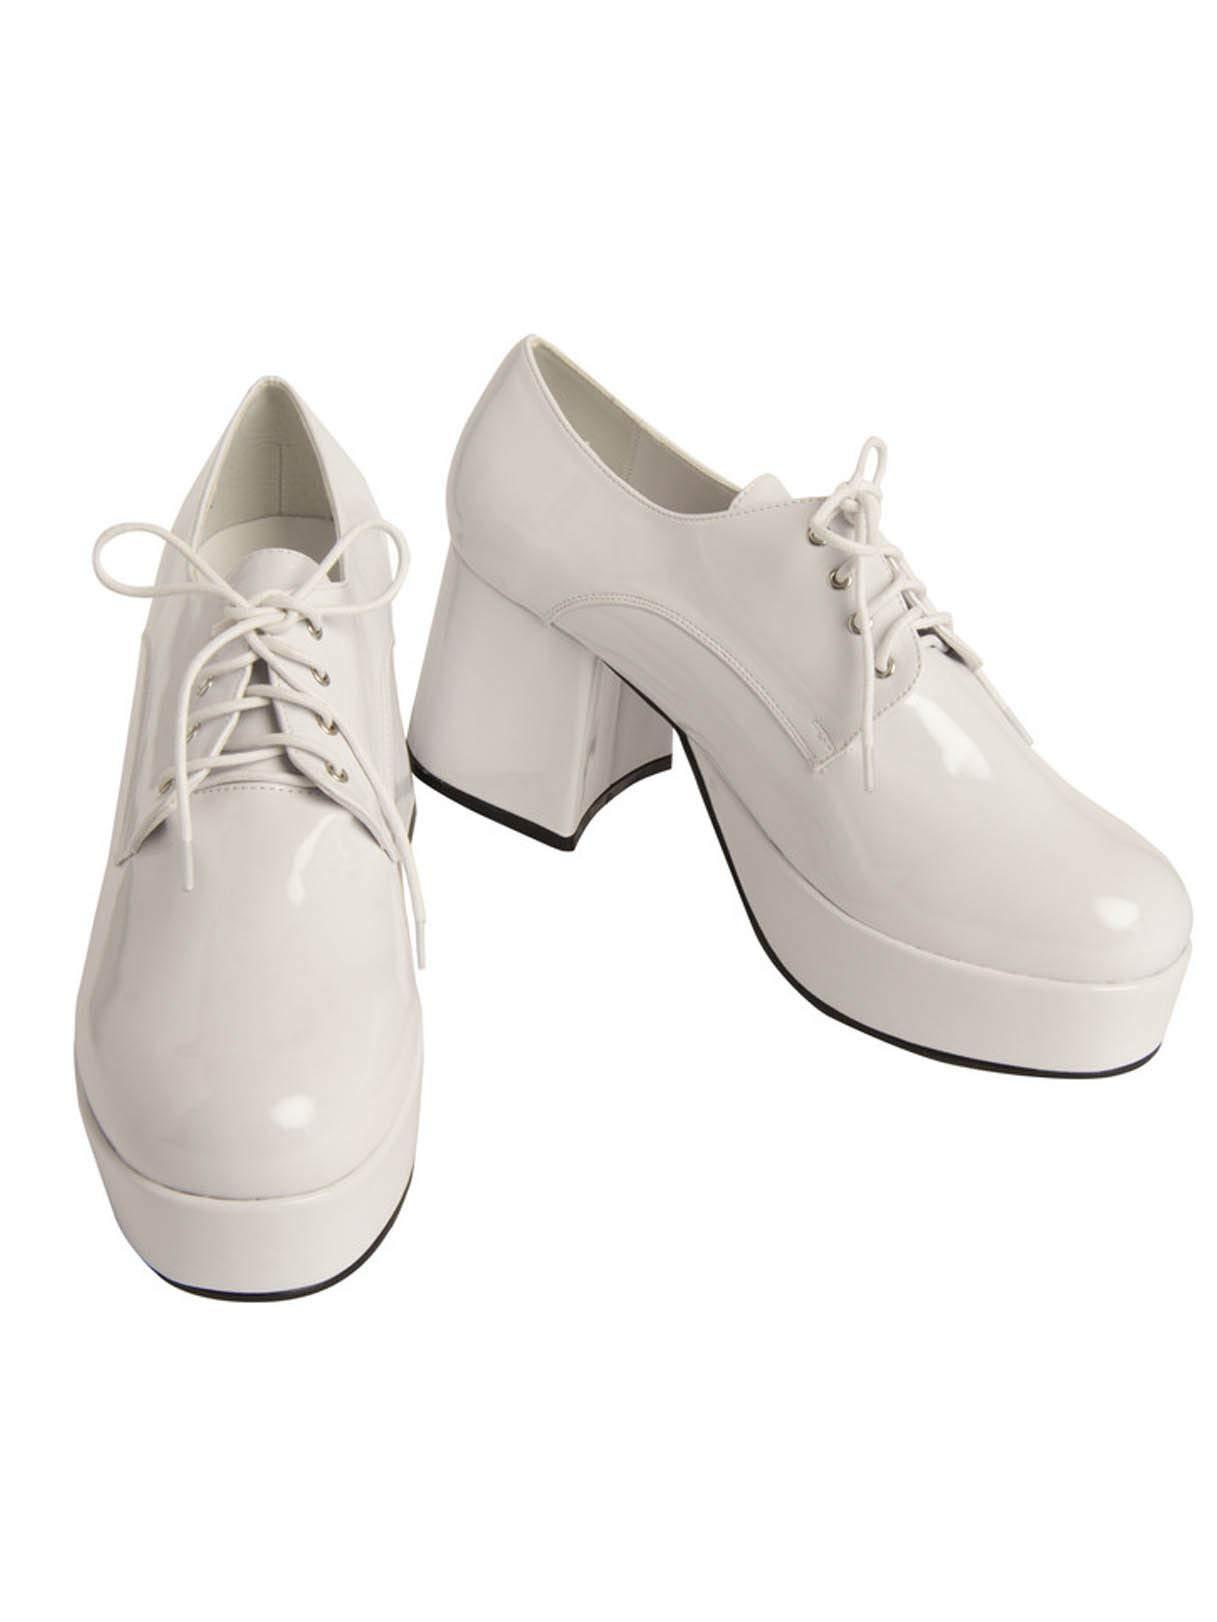 Mens Pimp Platform White Shoes (12/13)